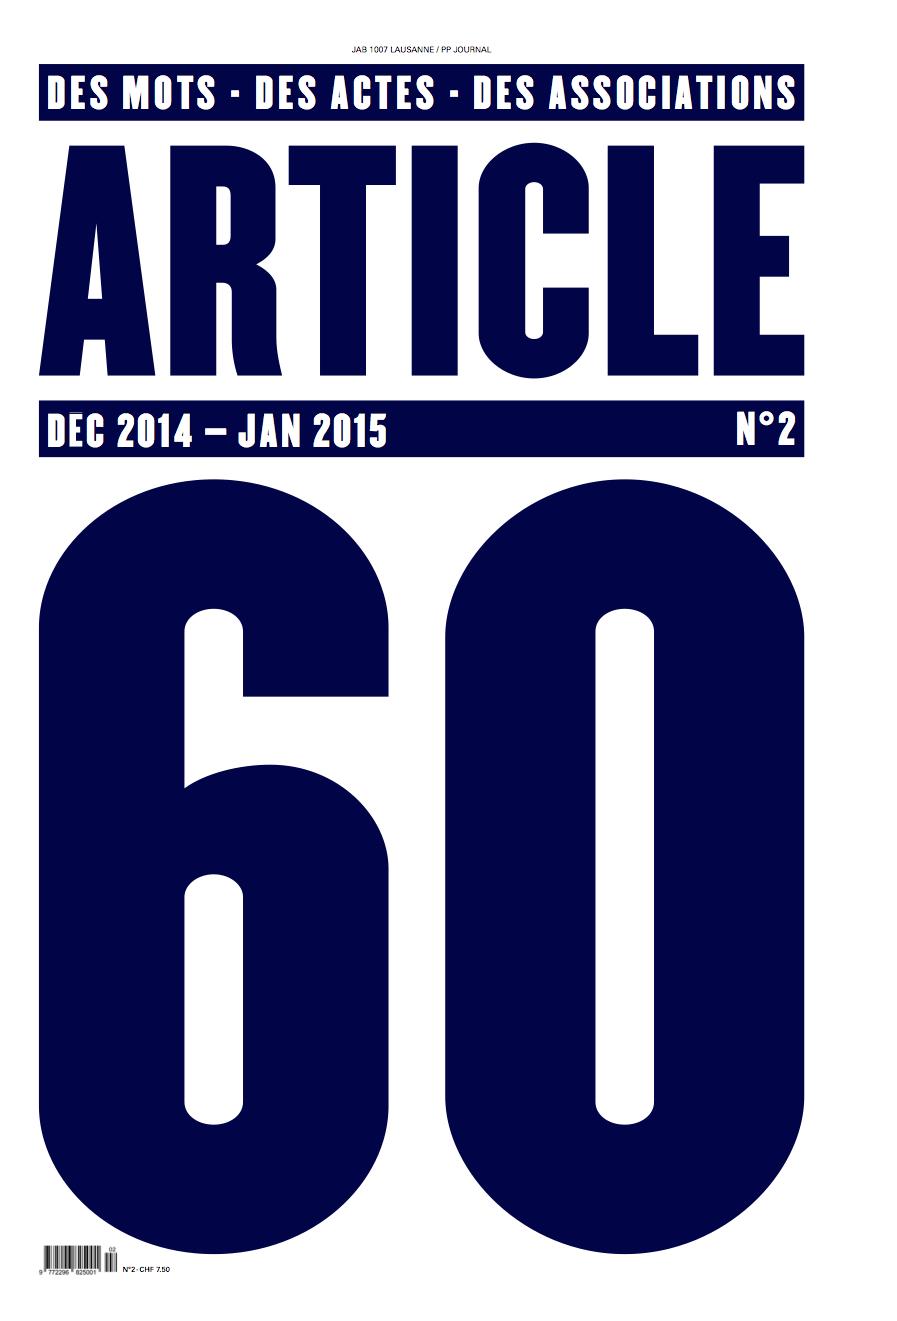 Article 60 N°2 UNE